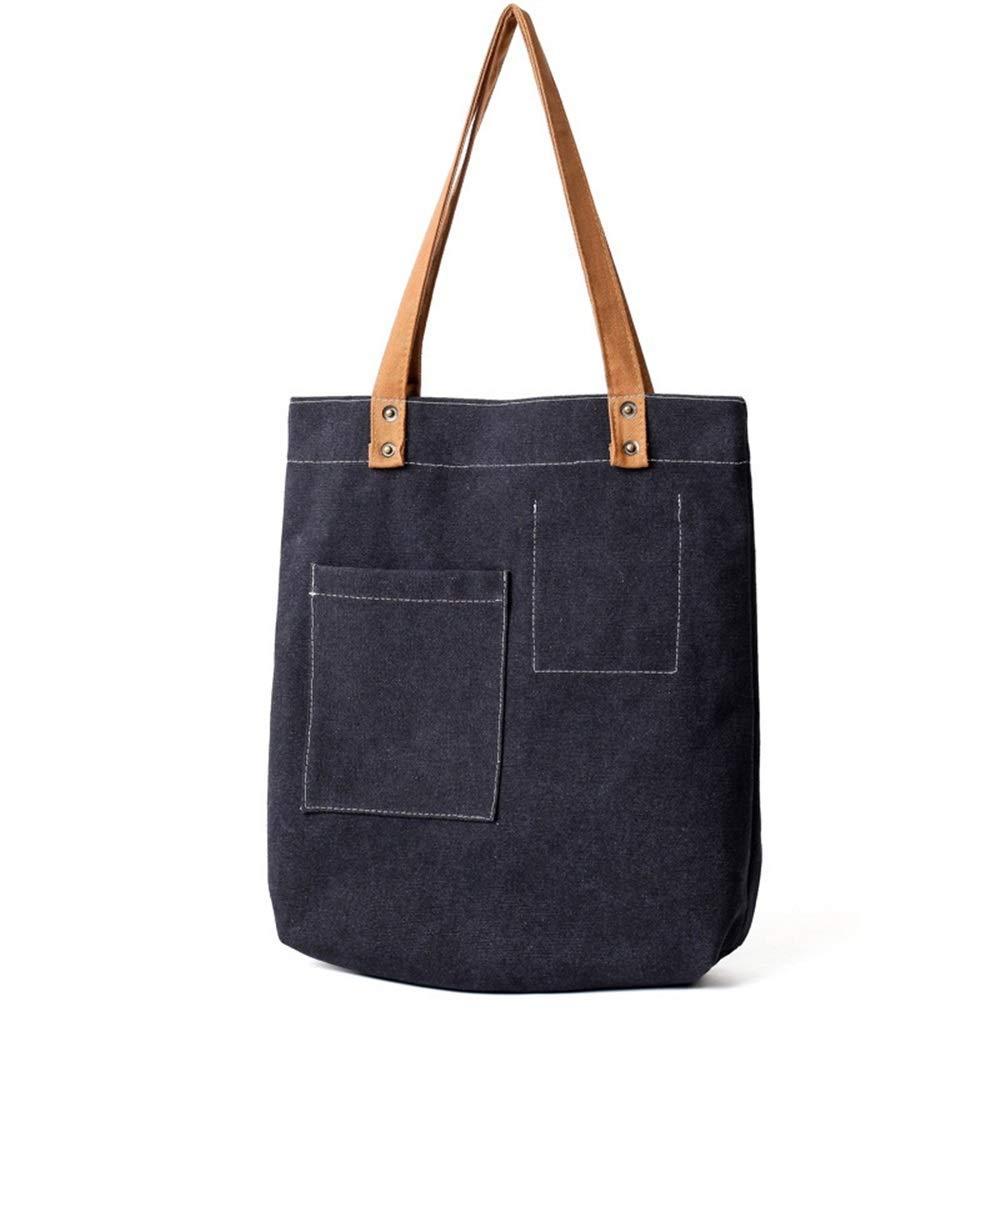 WHXYAA Ladies Canvas Shoulder Commuting Tote Bag Large-Capacity Shopping Beach Bag (Black) Simple Atmosphere